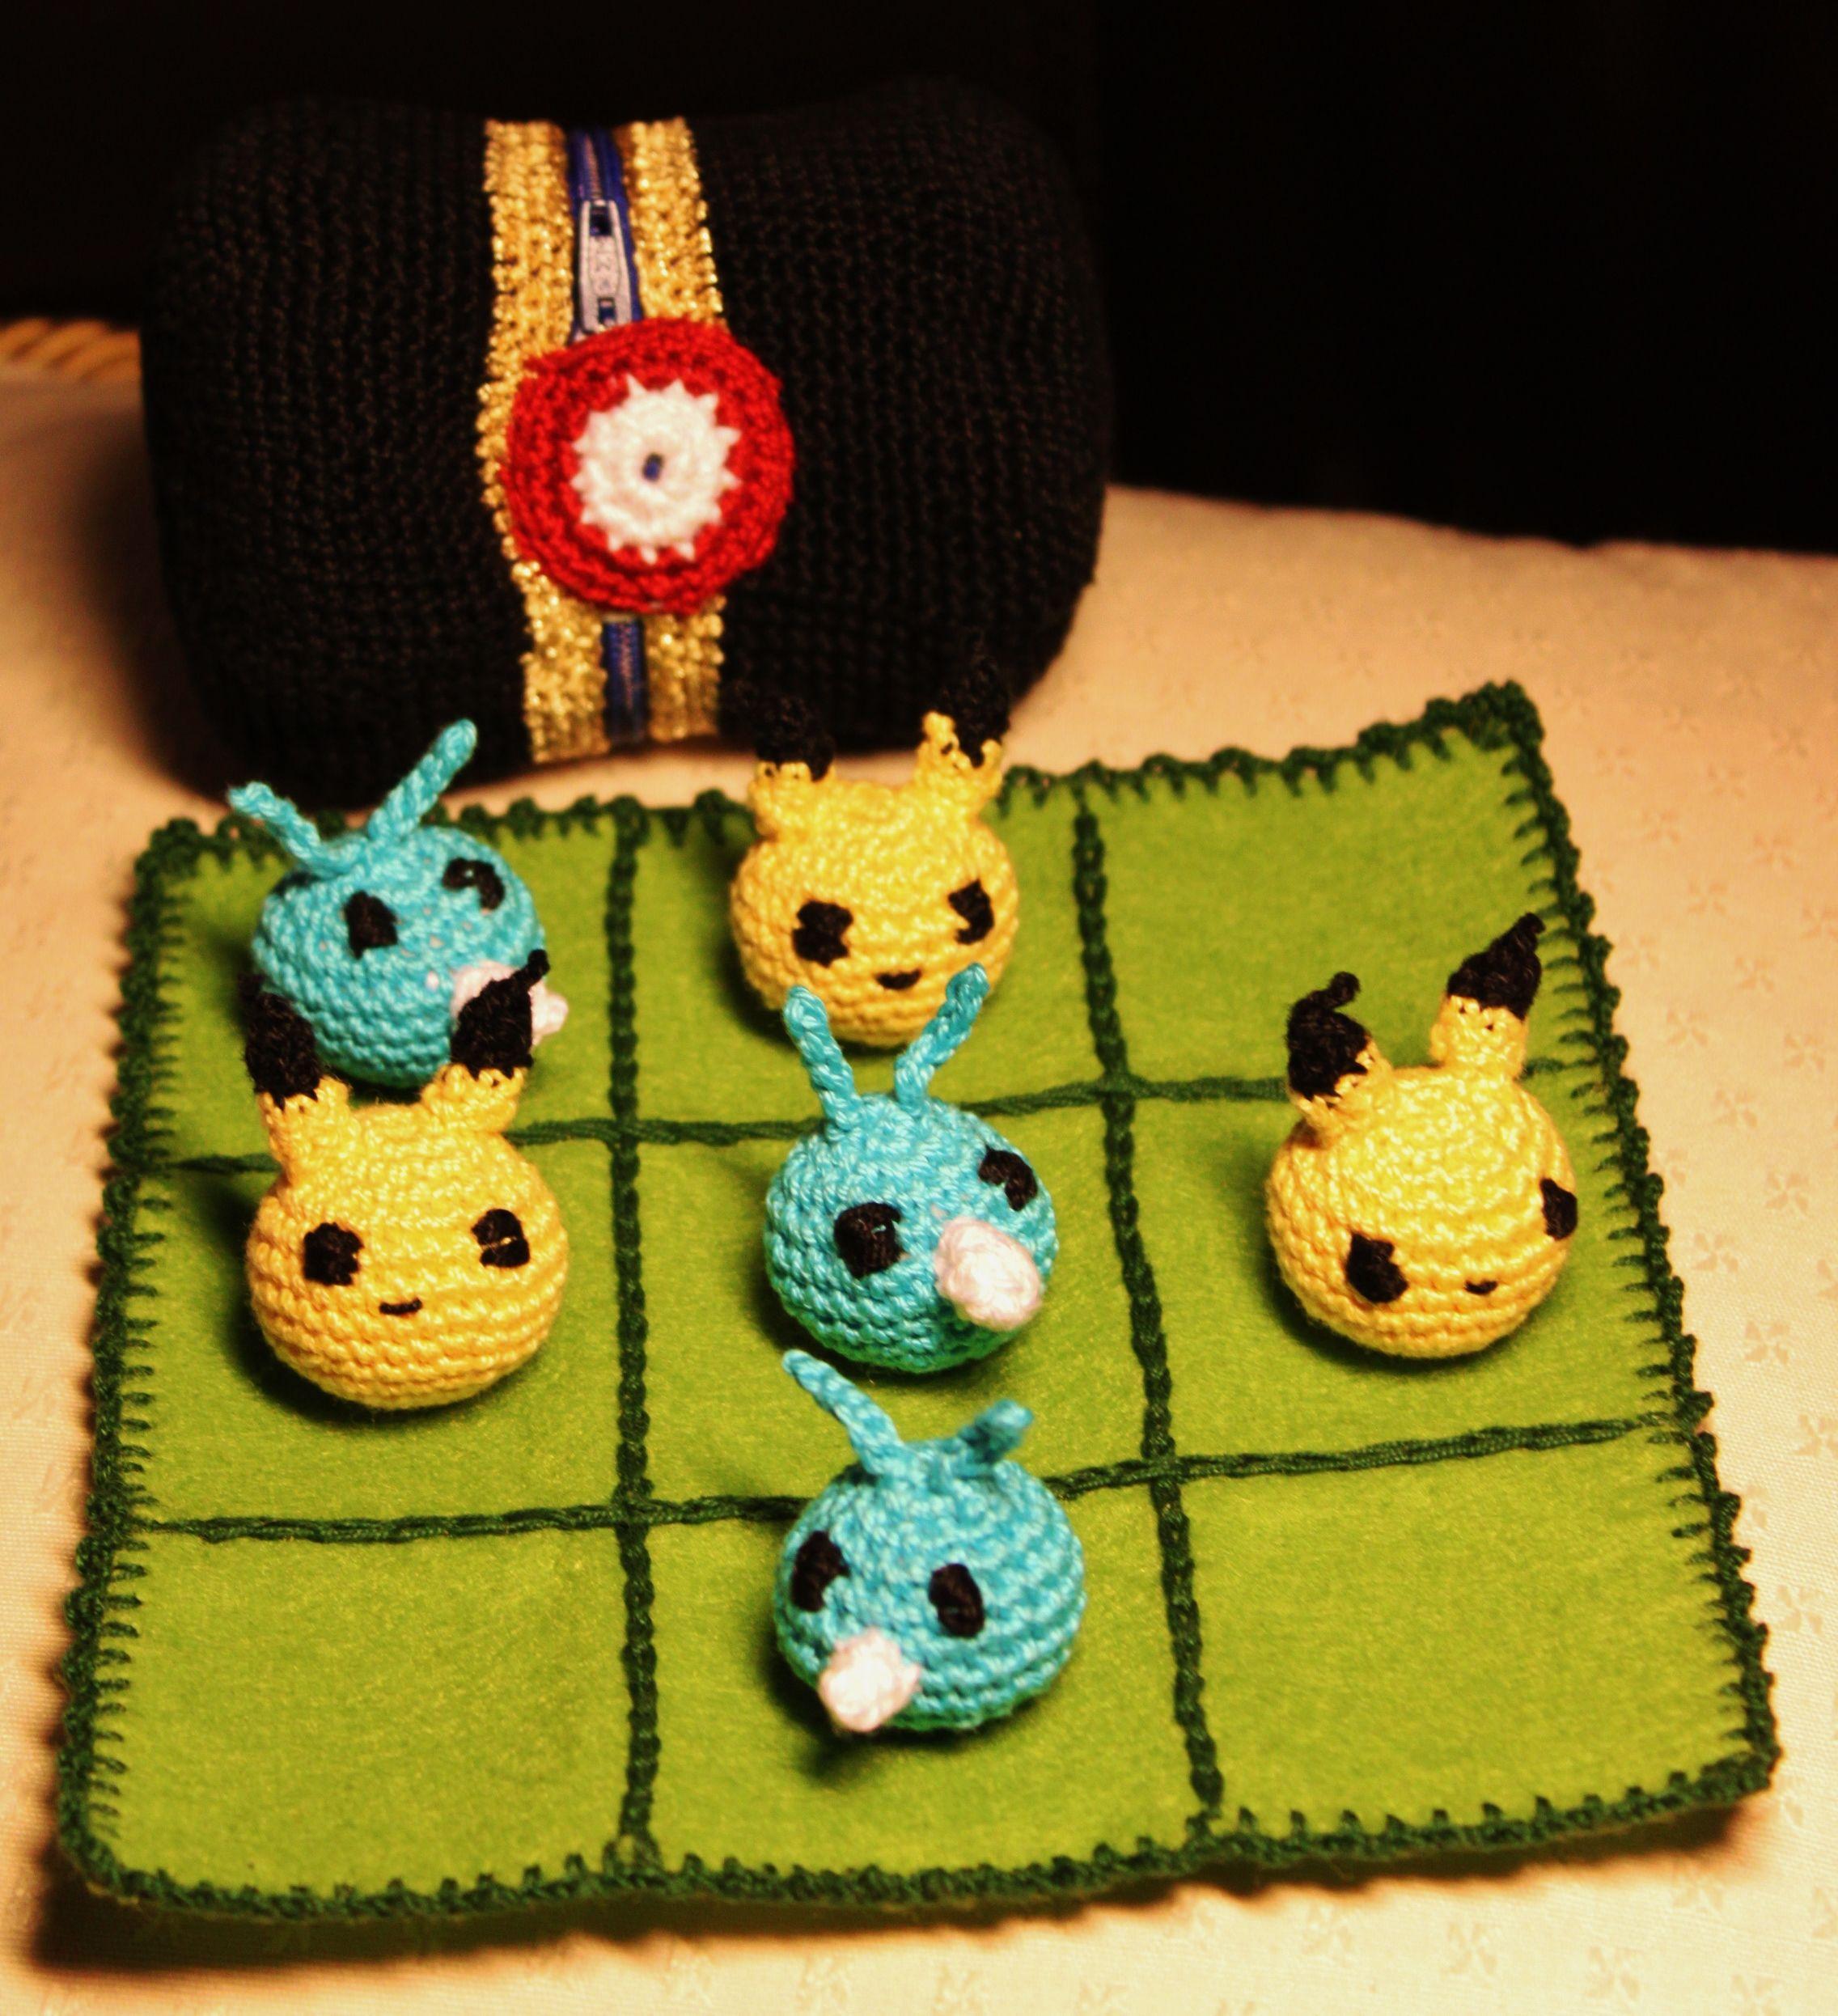 Crochet Jogo Do Galo Jogo Do Galo Croche Galo